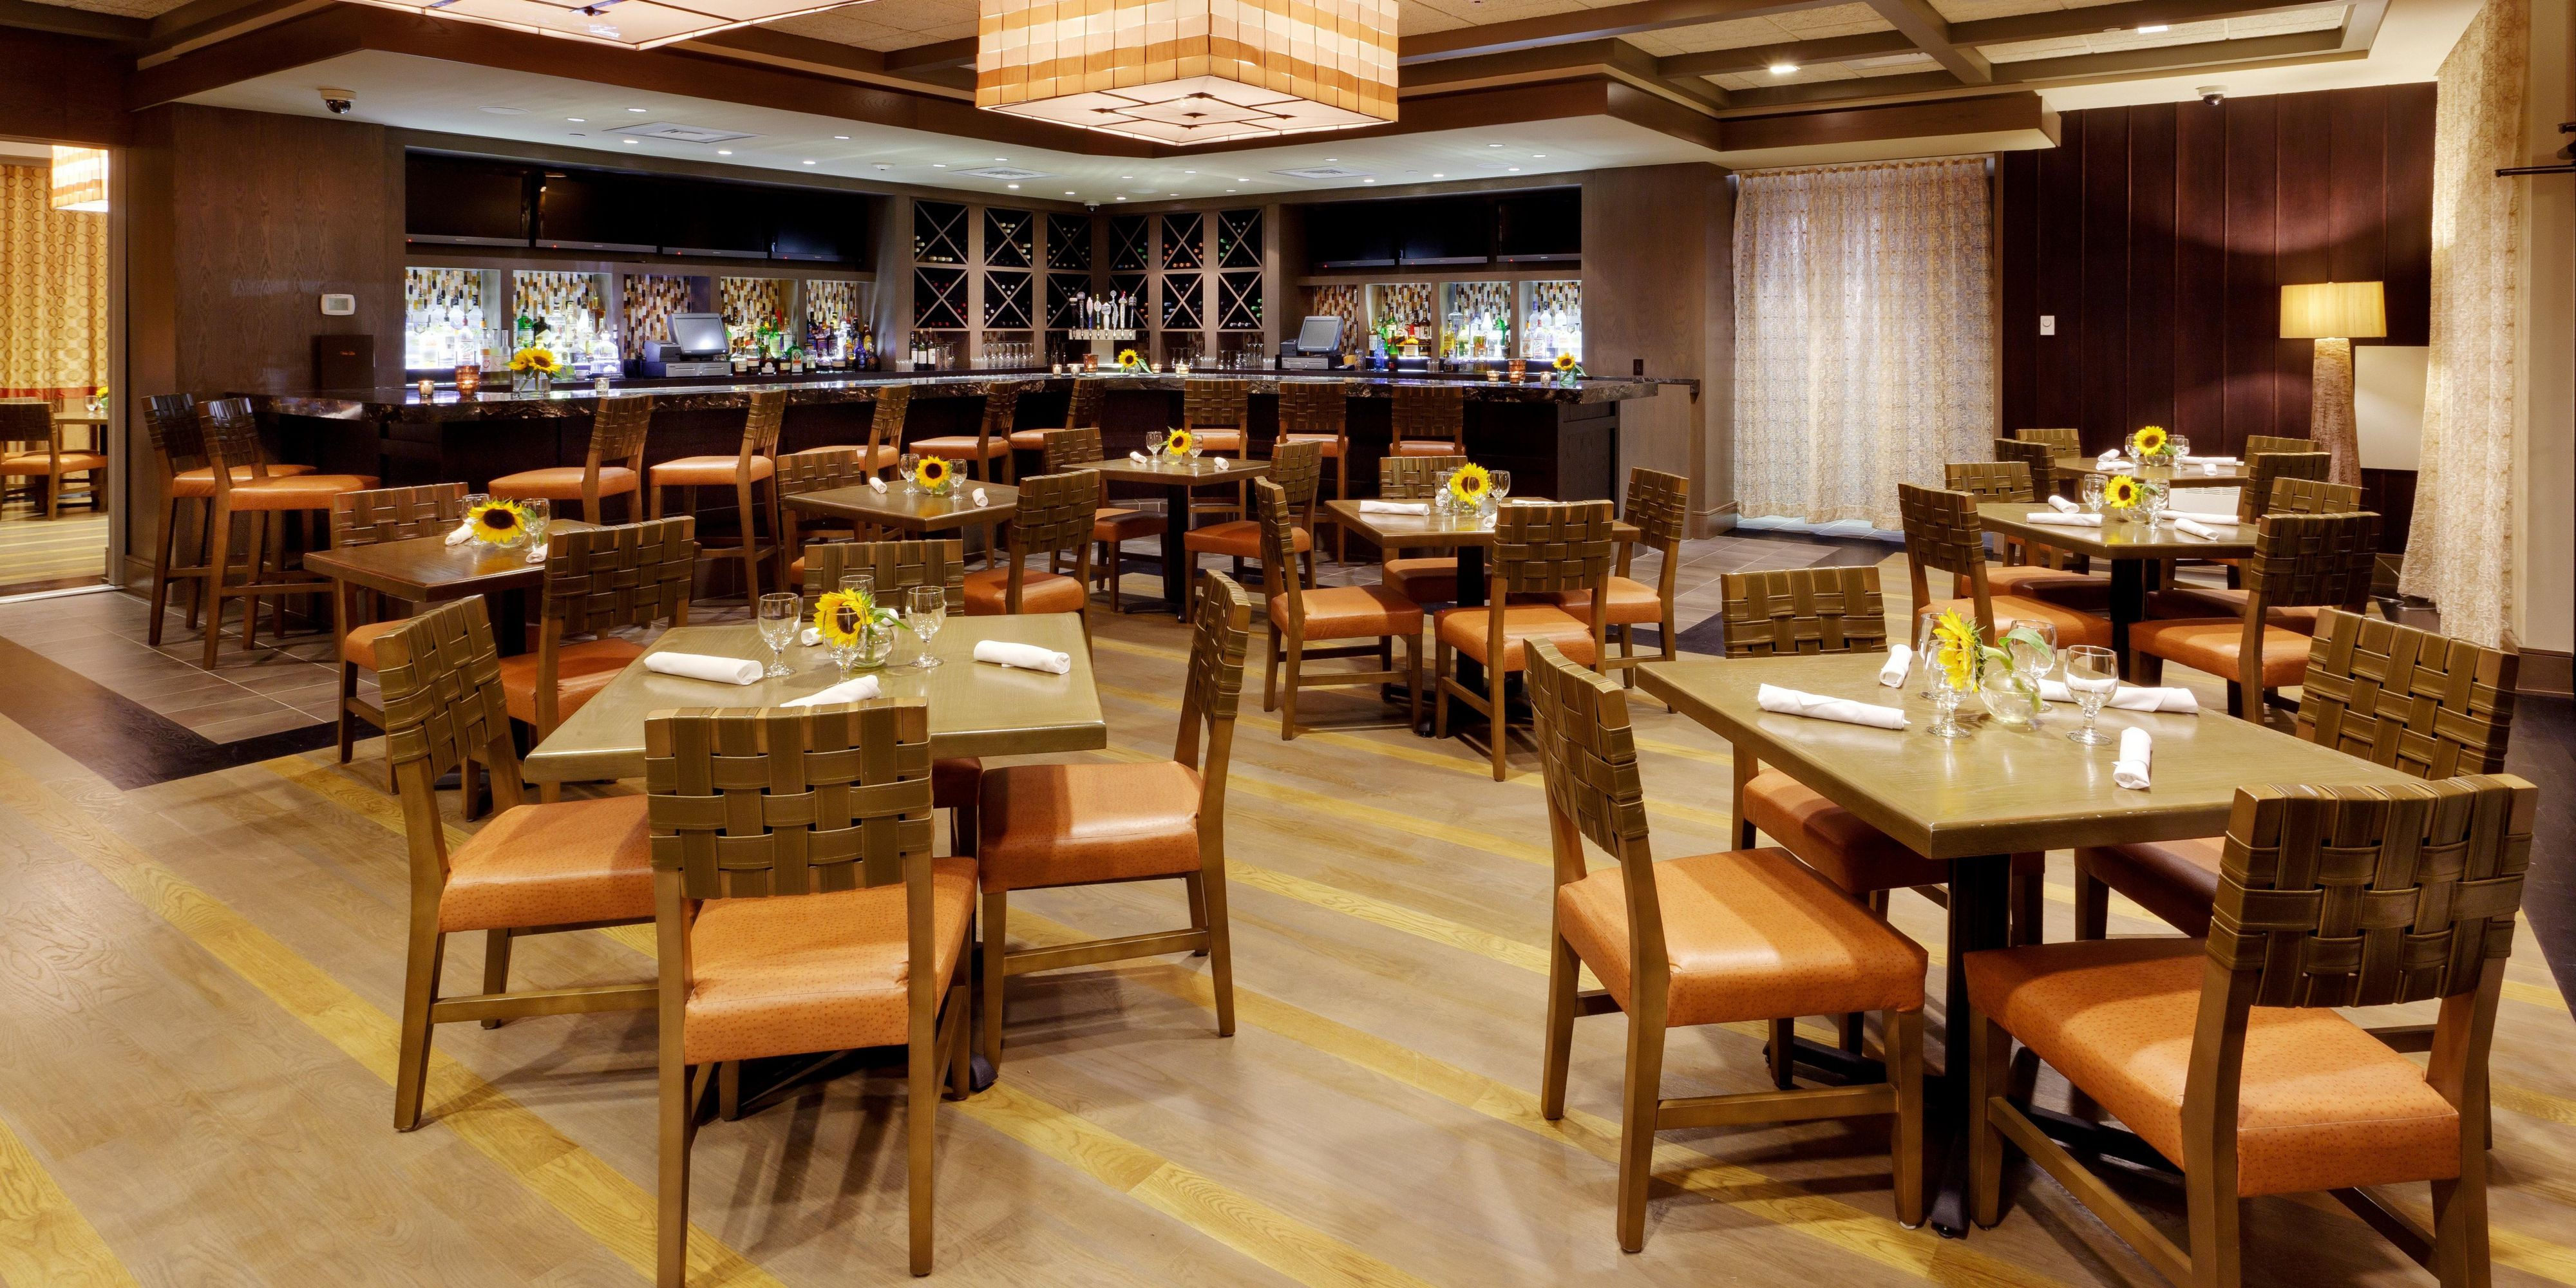 Hotel Indigo Long Island - East End image 3